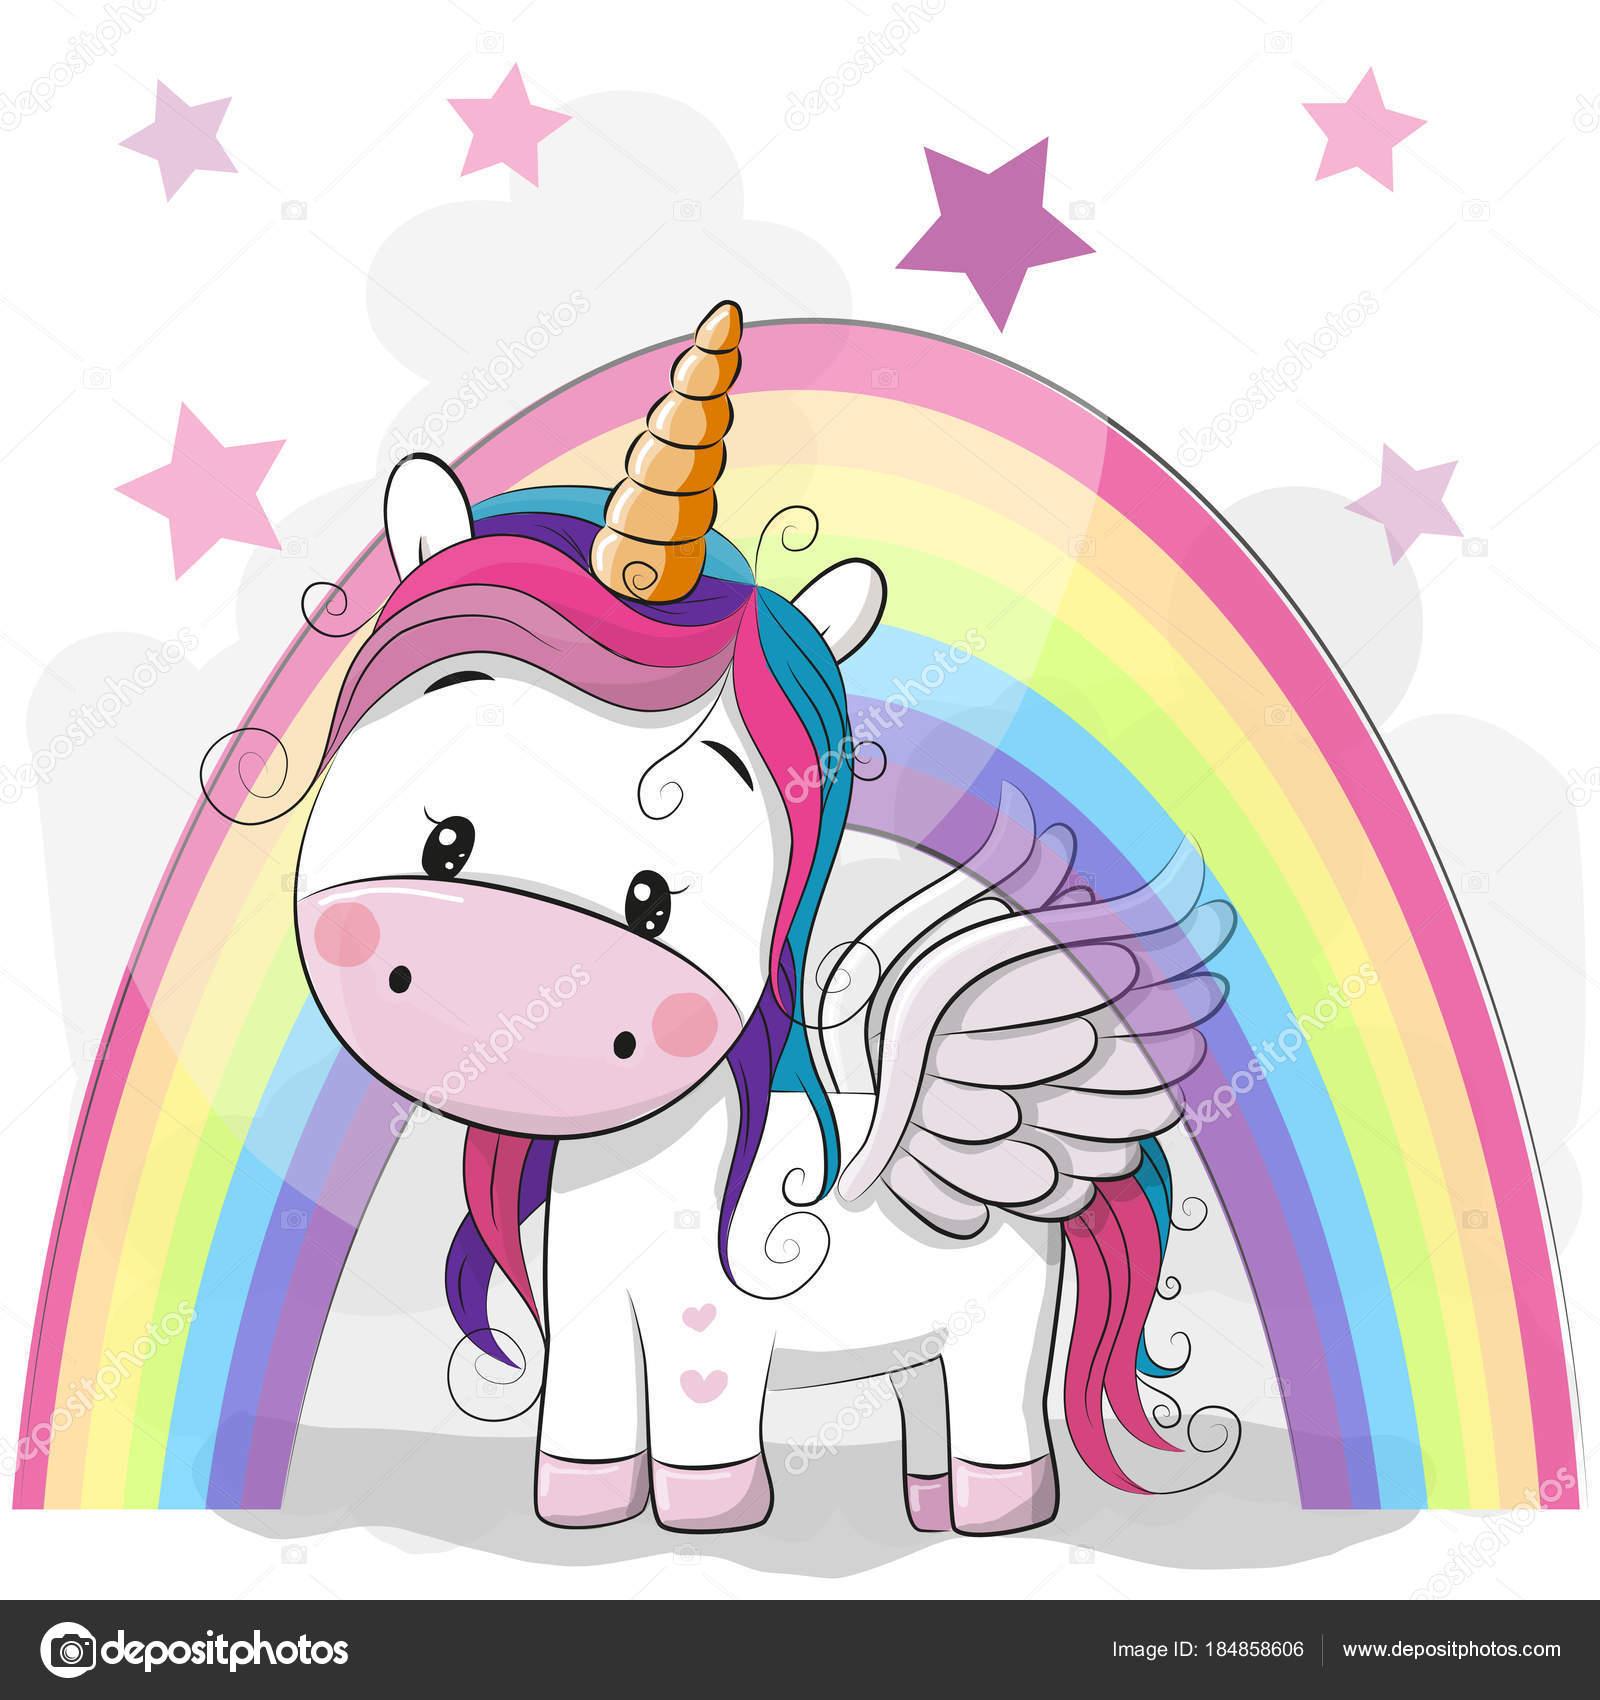 Áˆ Unicorns Cartoon Stock Backgrounds Royalty Free Unicorn Illustrations Download On Depositphotos